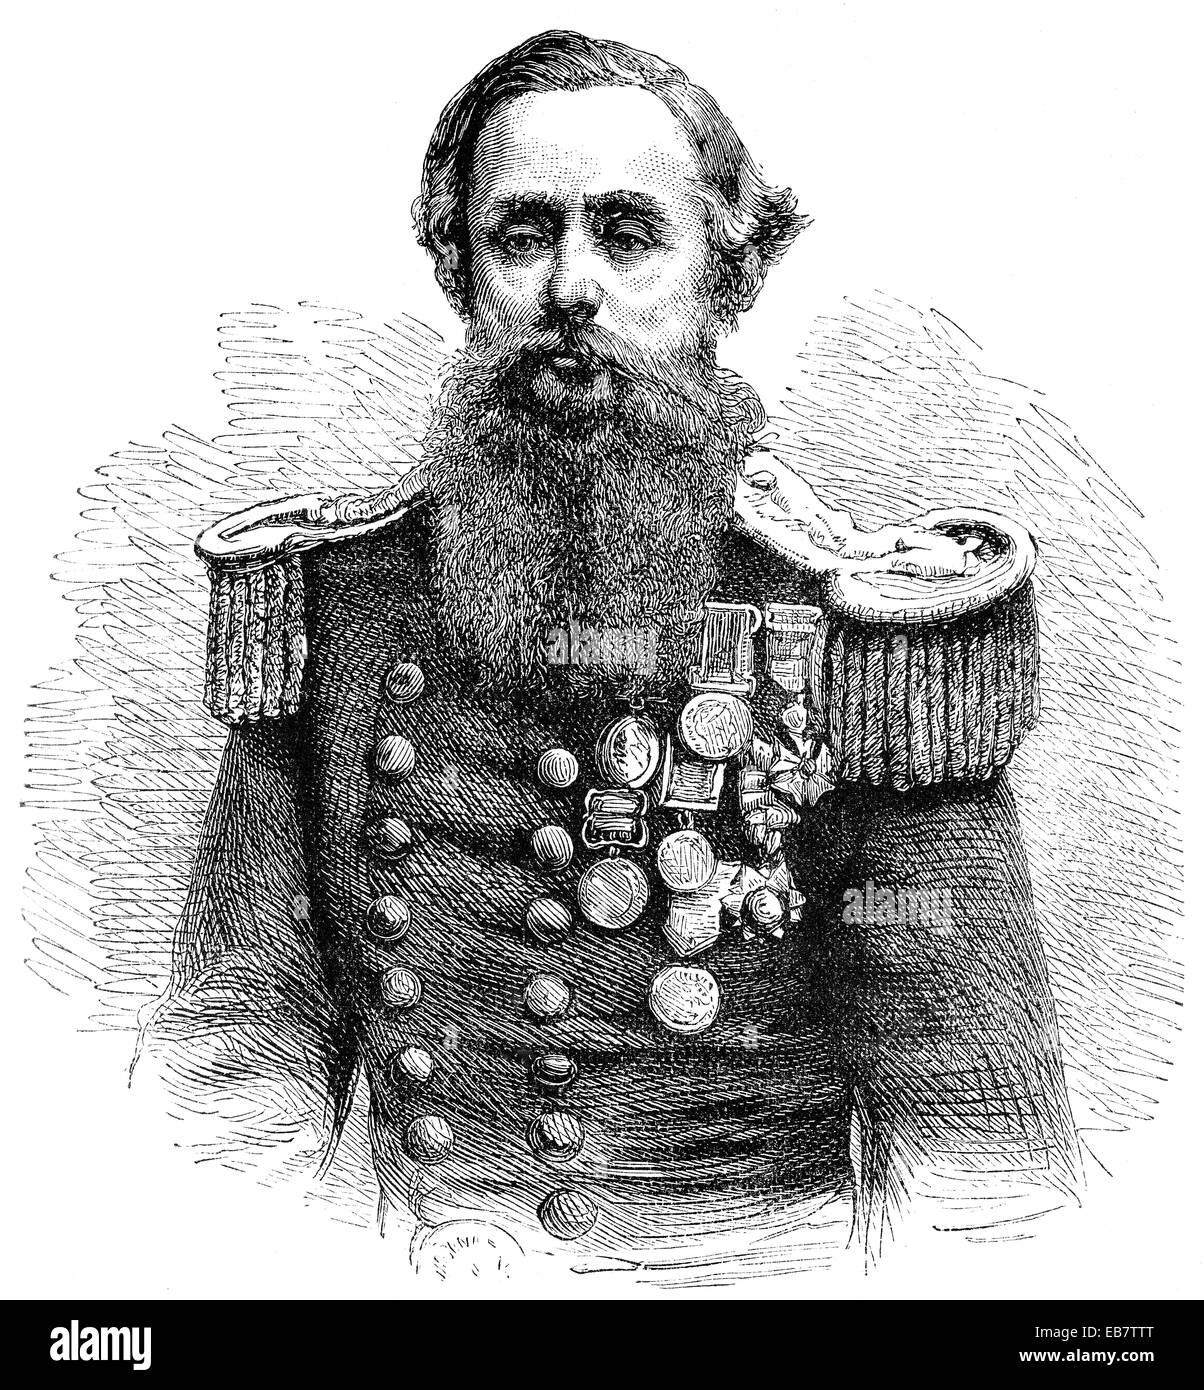 Captain Cowper Phipps Coles, 1819 - 1870, an English naval captain and inventor, Cowper Phipps Coles, 1819 - 1870, - Stock Image